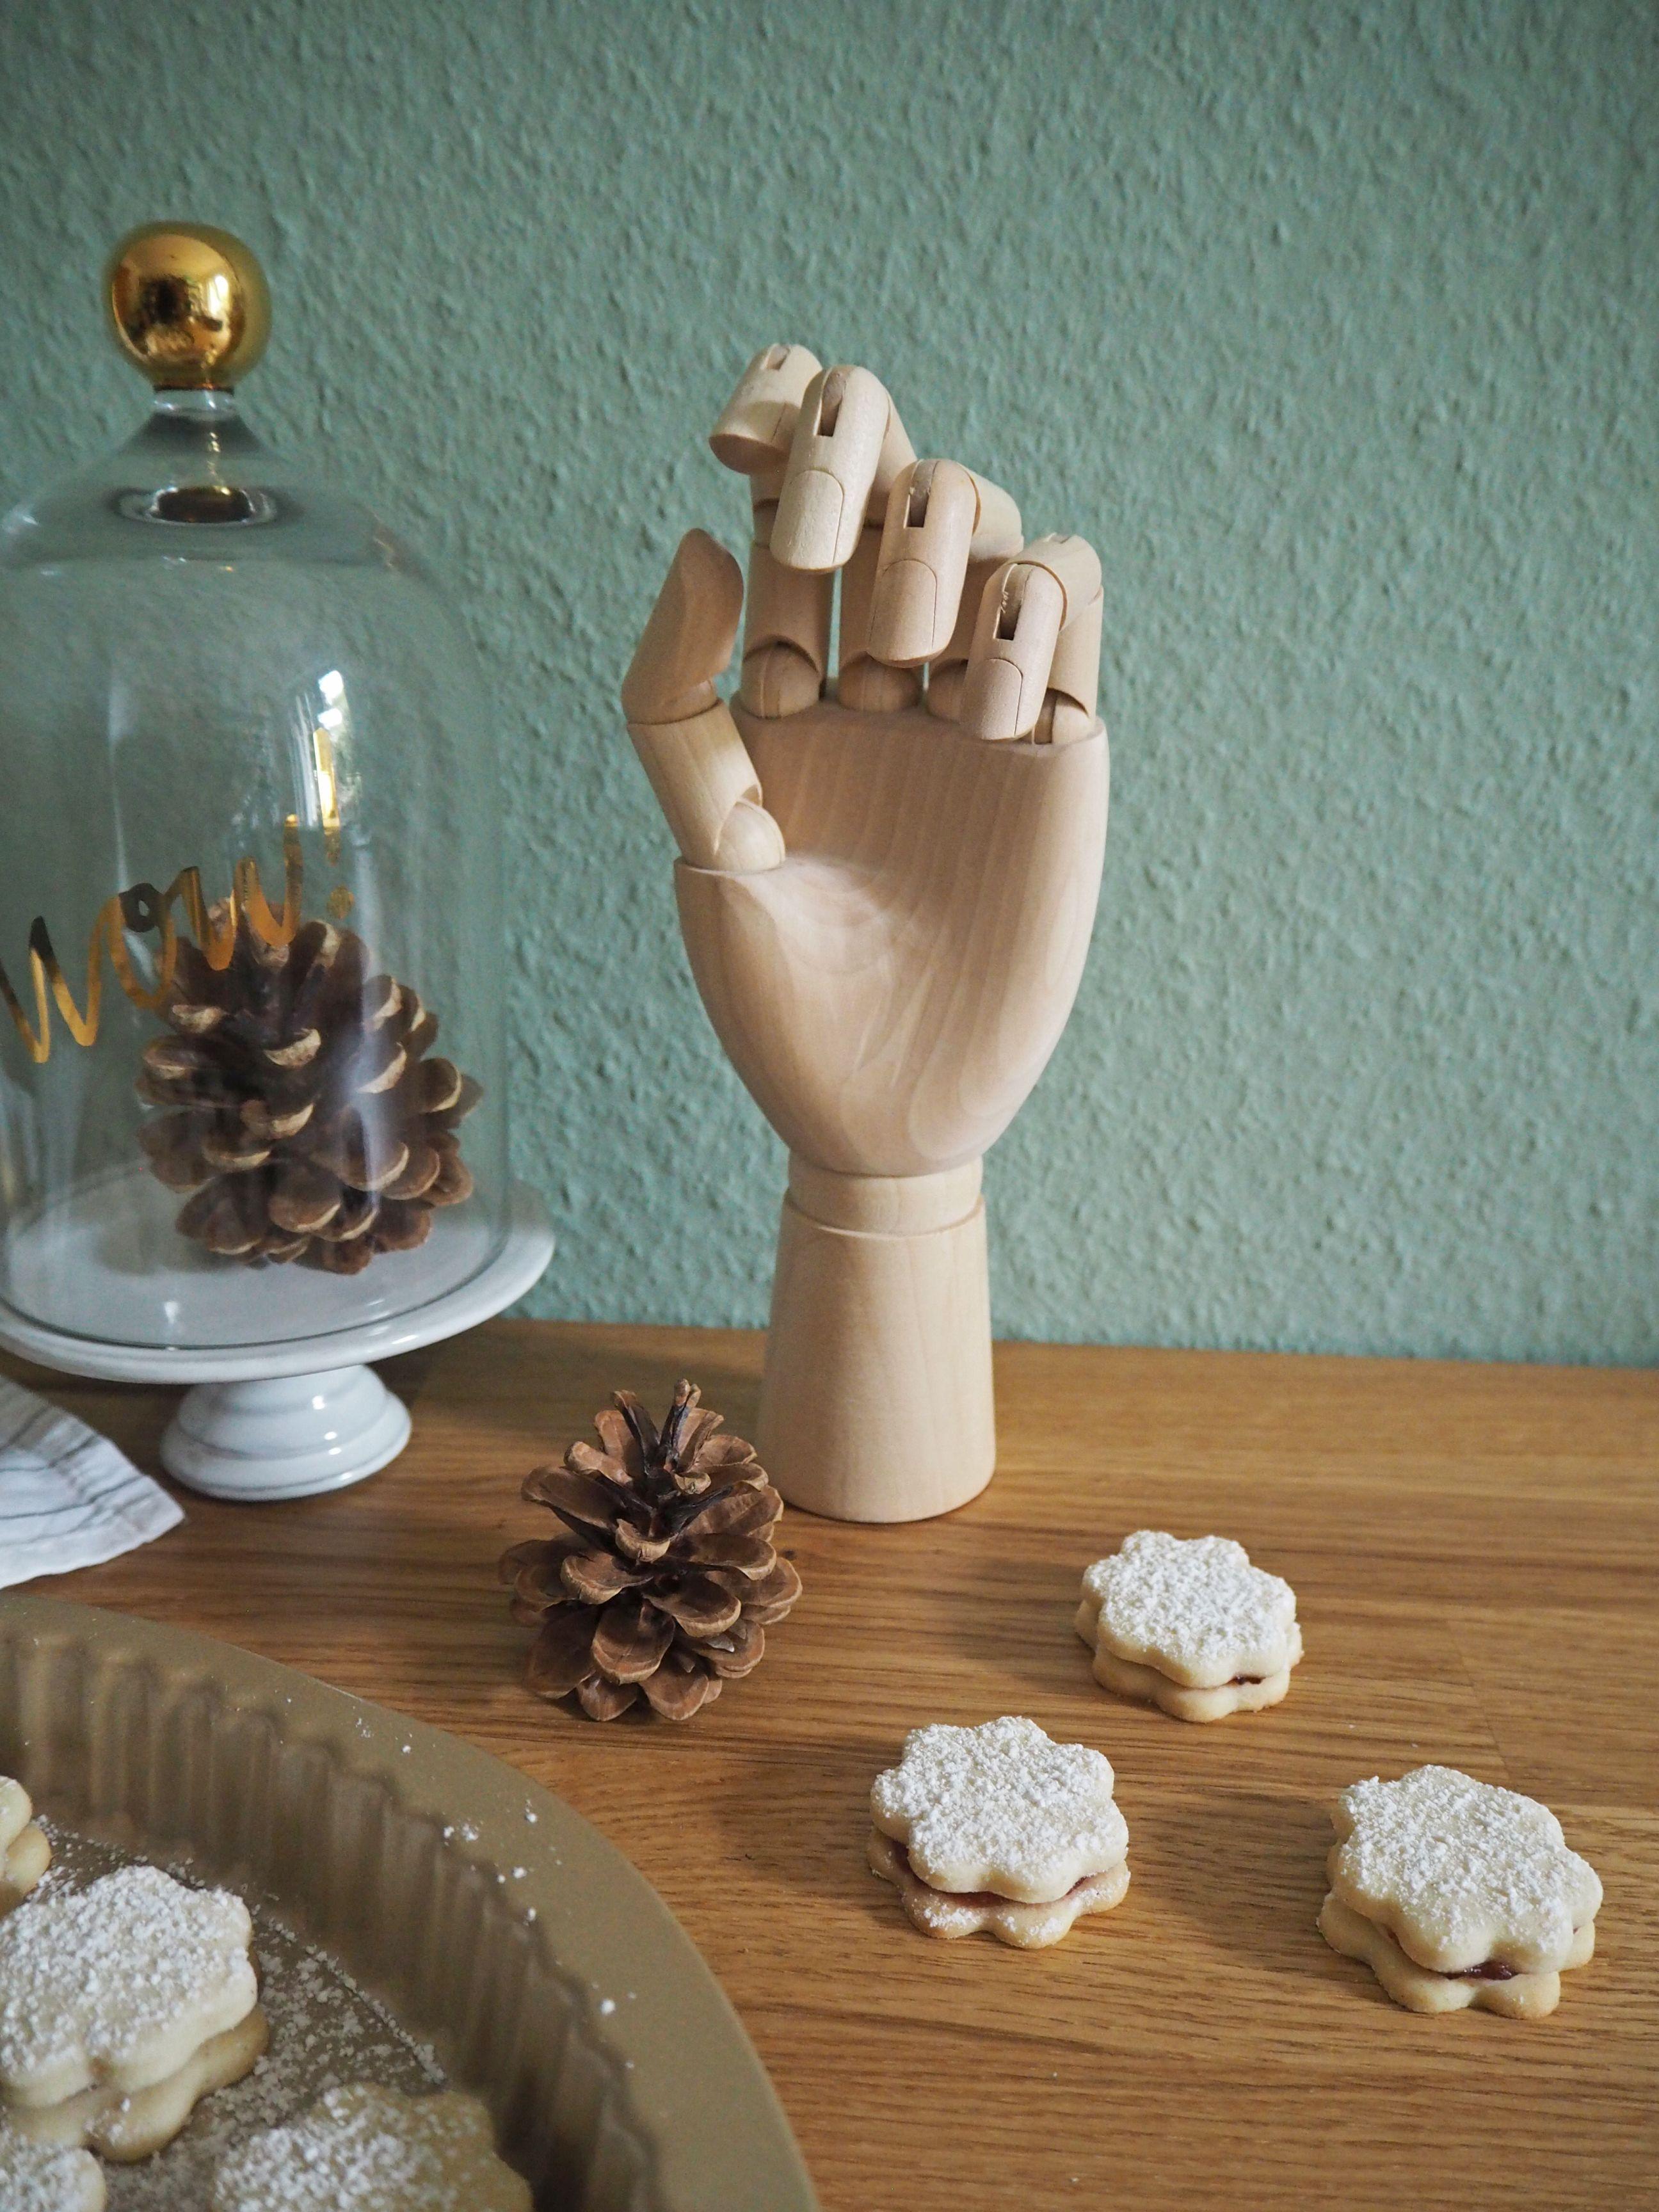 2018-skoen-och-kreativ-food-god-jul-plaetzchen-vanille-cookies-mit-marmelade (5)